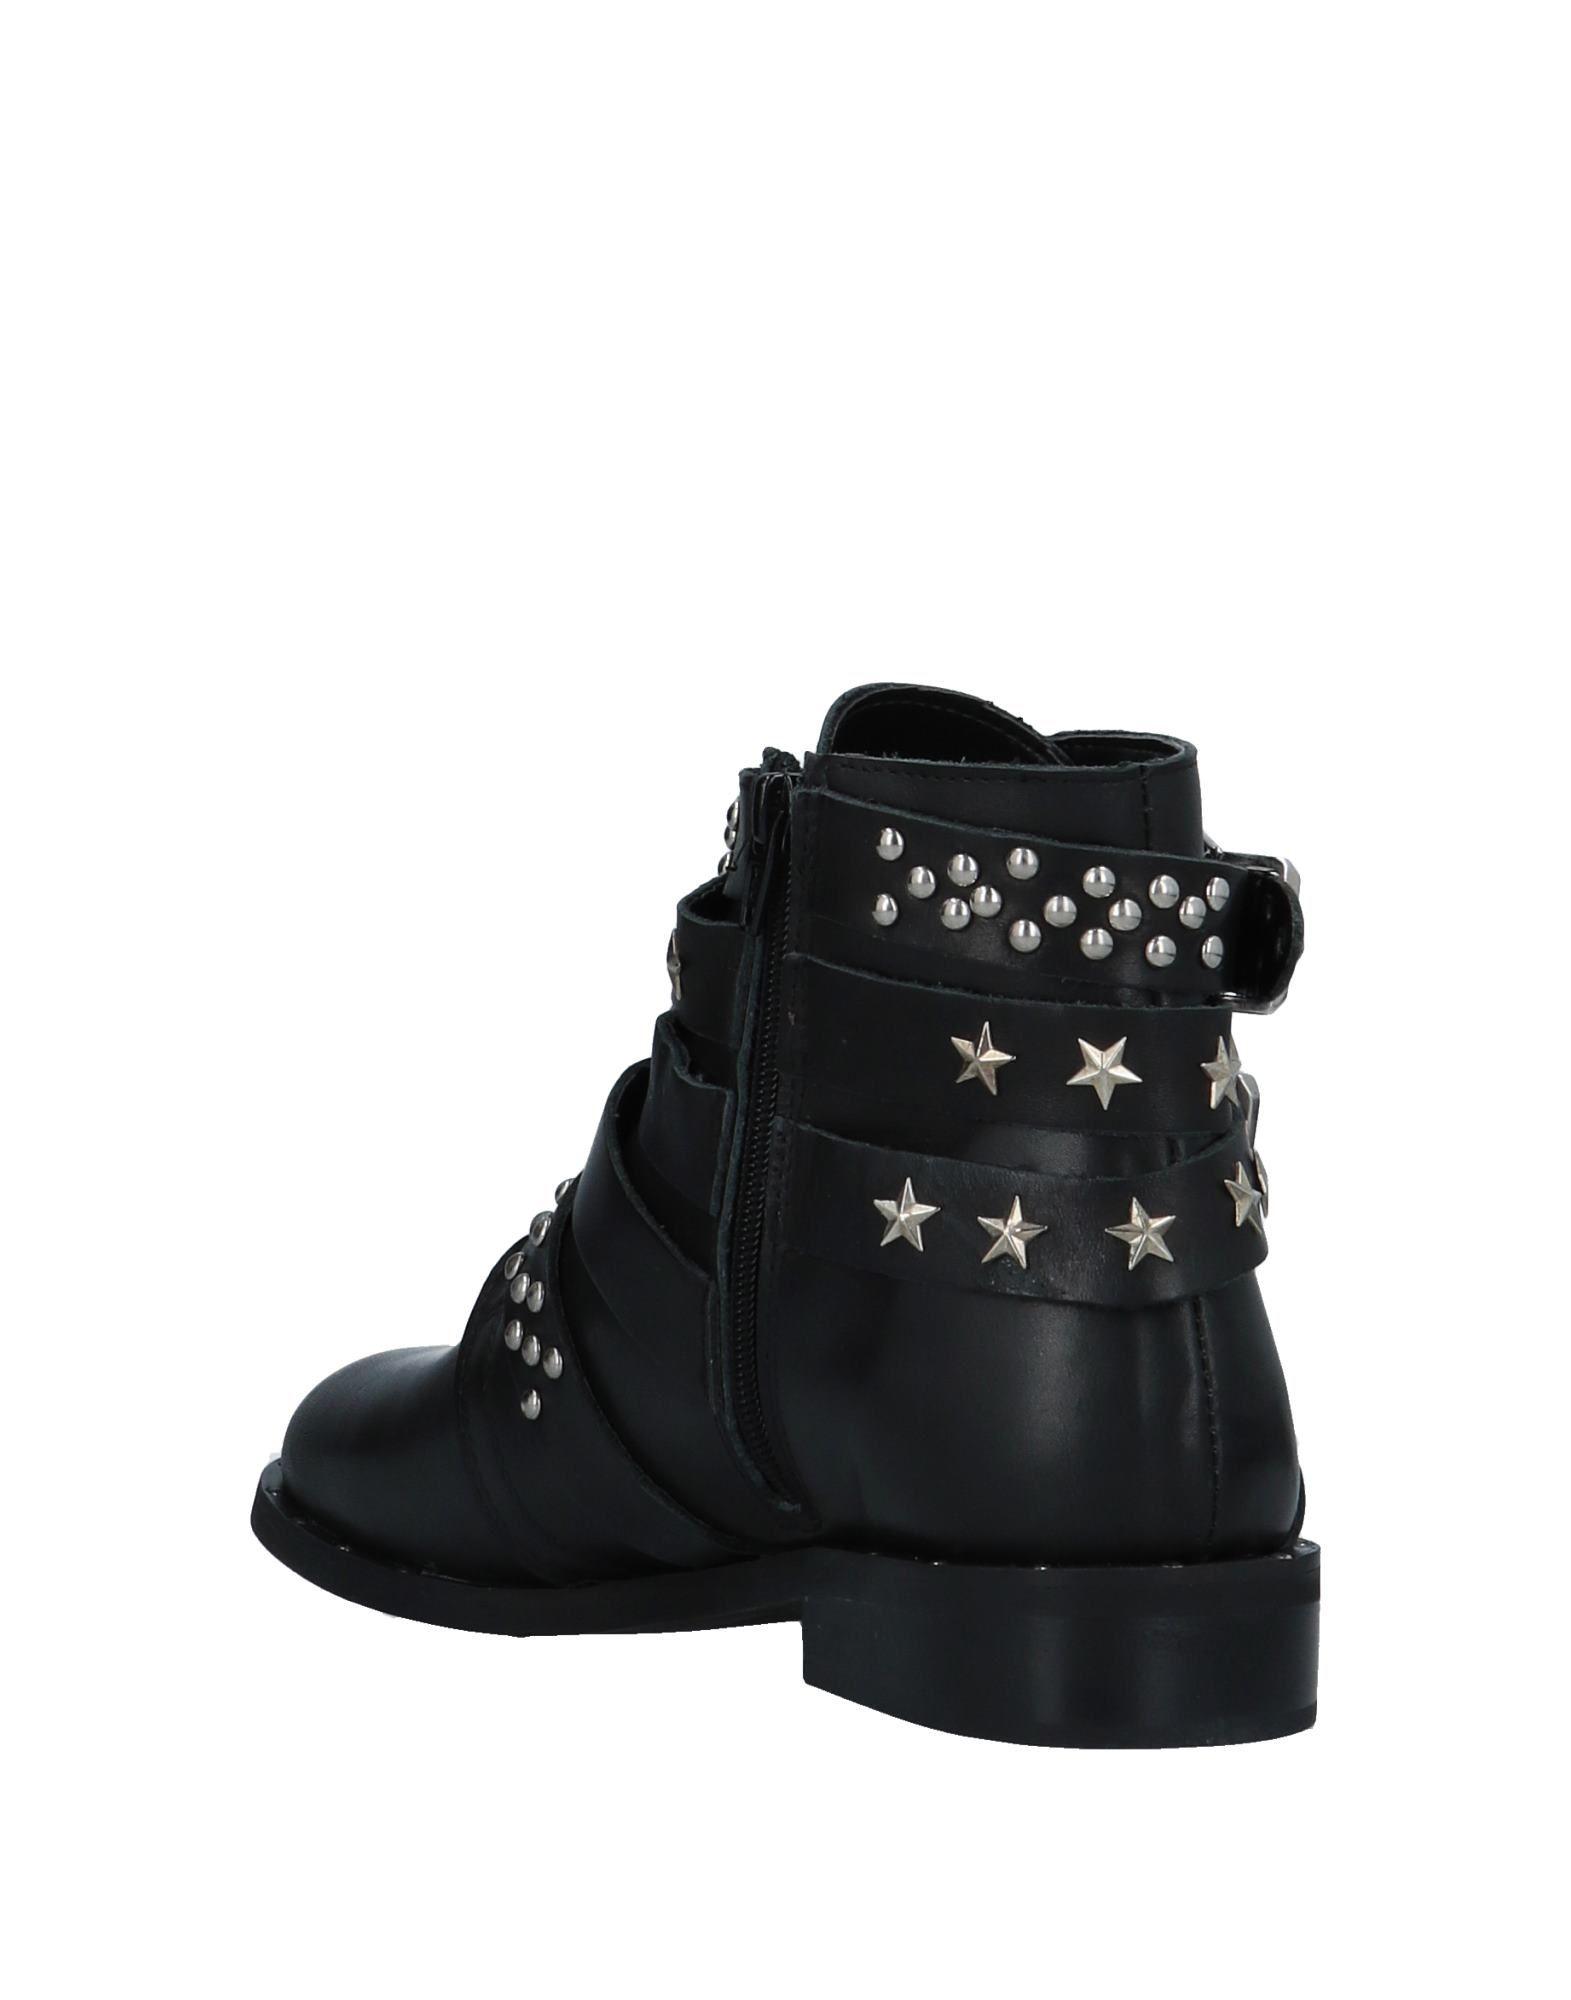 Stilvolle billige  Schuhe J.Born Stiefelette Damen  billige 11532866DU 0e4d93